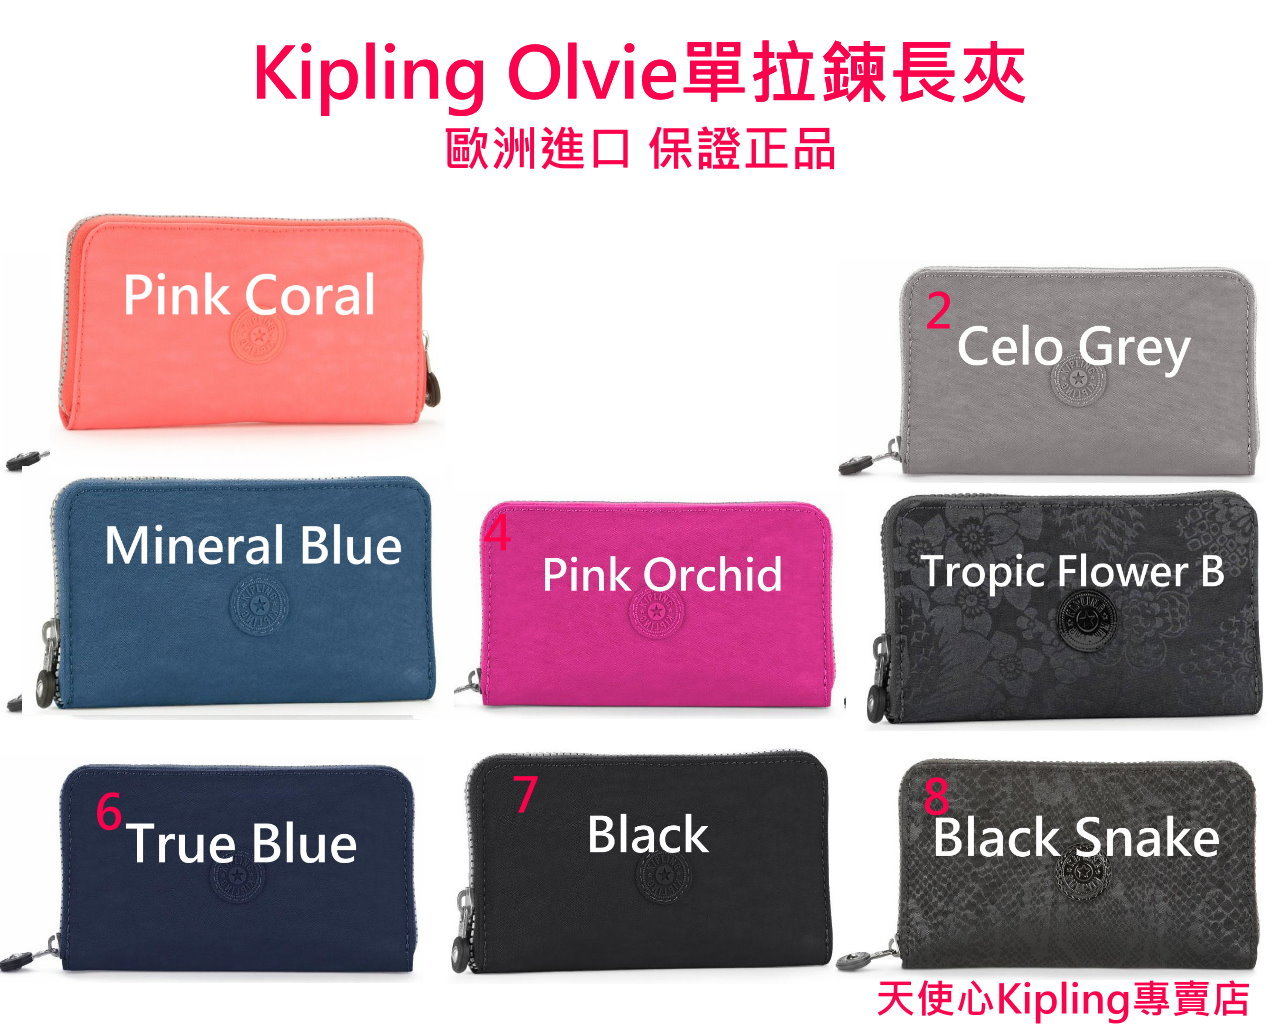 бумажник Kipling k15314 OLIVE бумажник kipling k10625